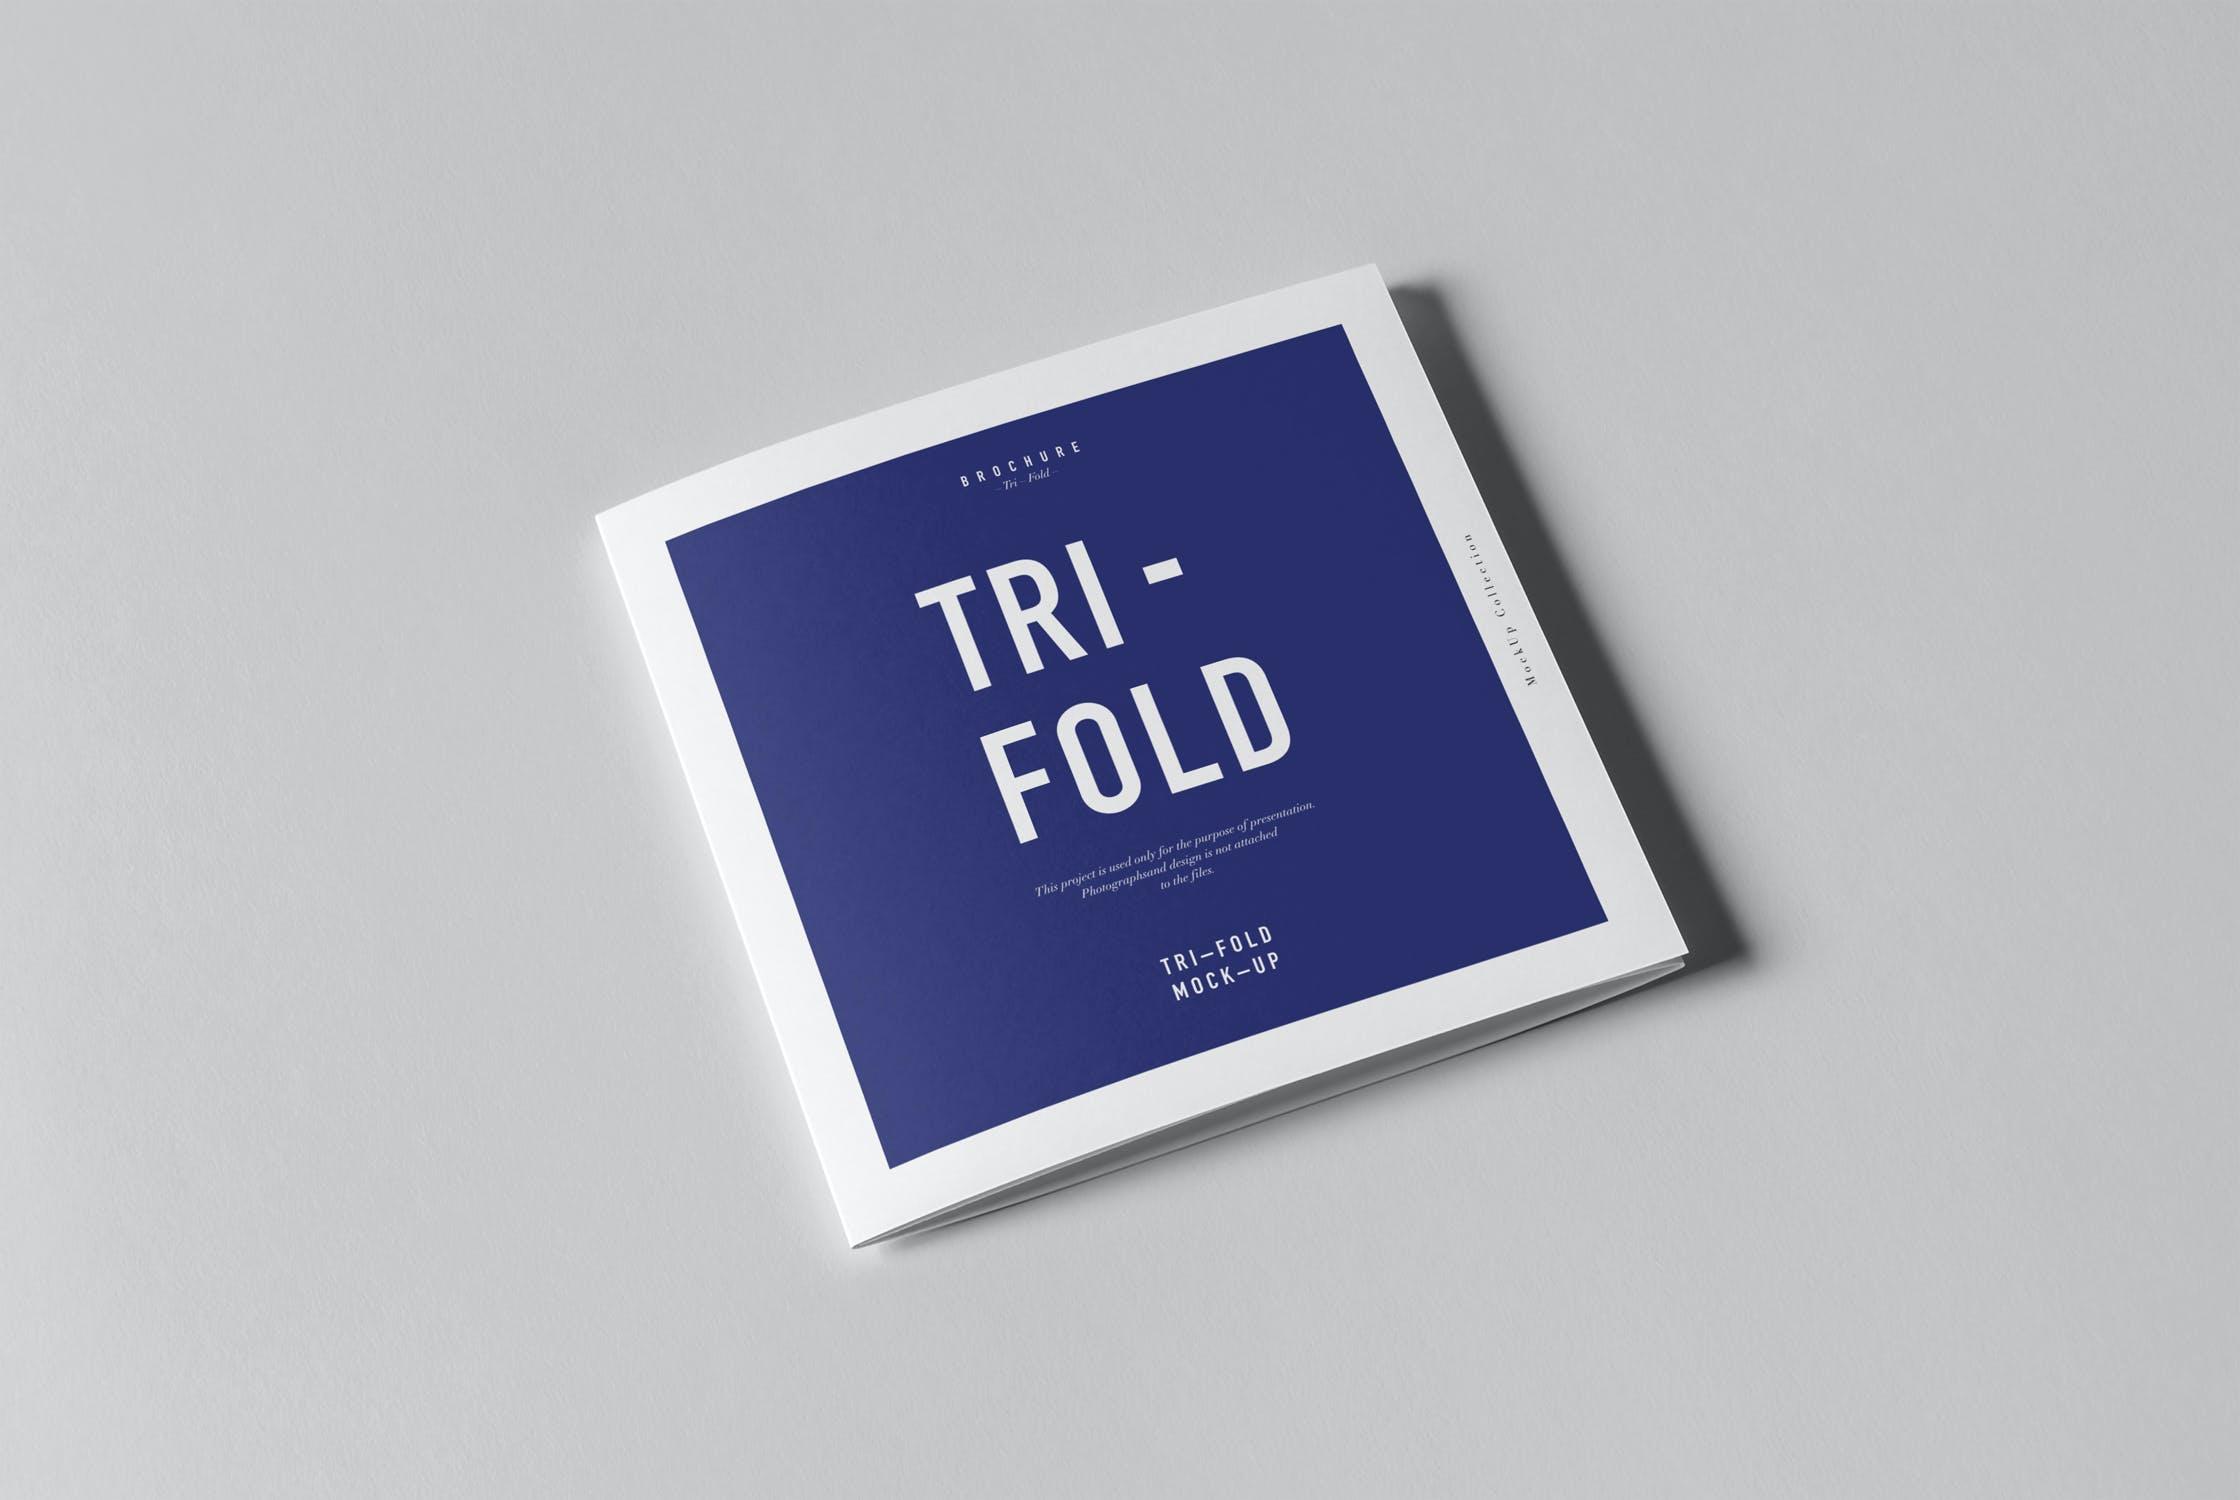 8款三折页小册子设计展示样机模板 Tri-Fold Square Brochure Mockup插图(1)